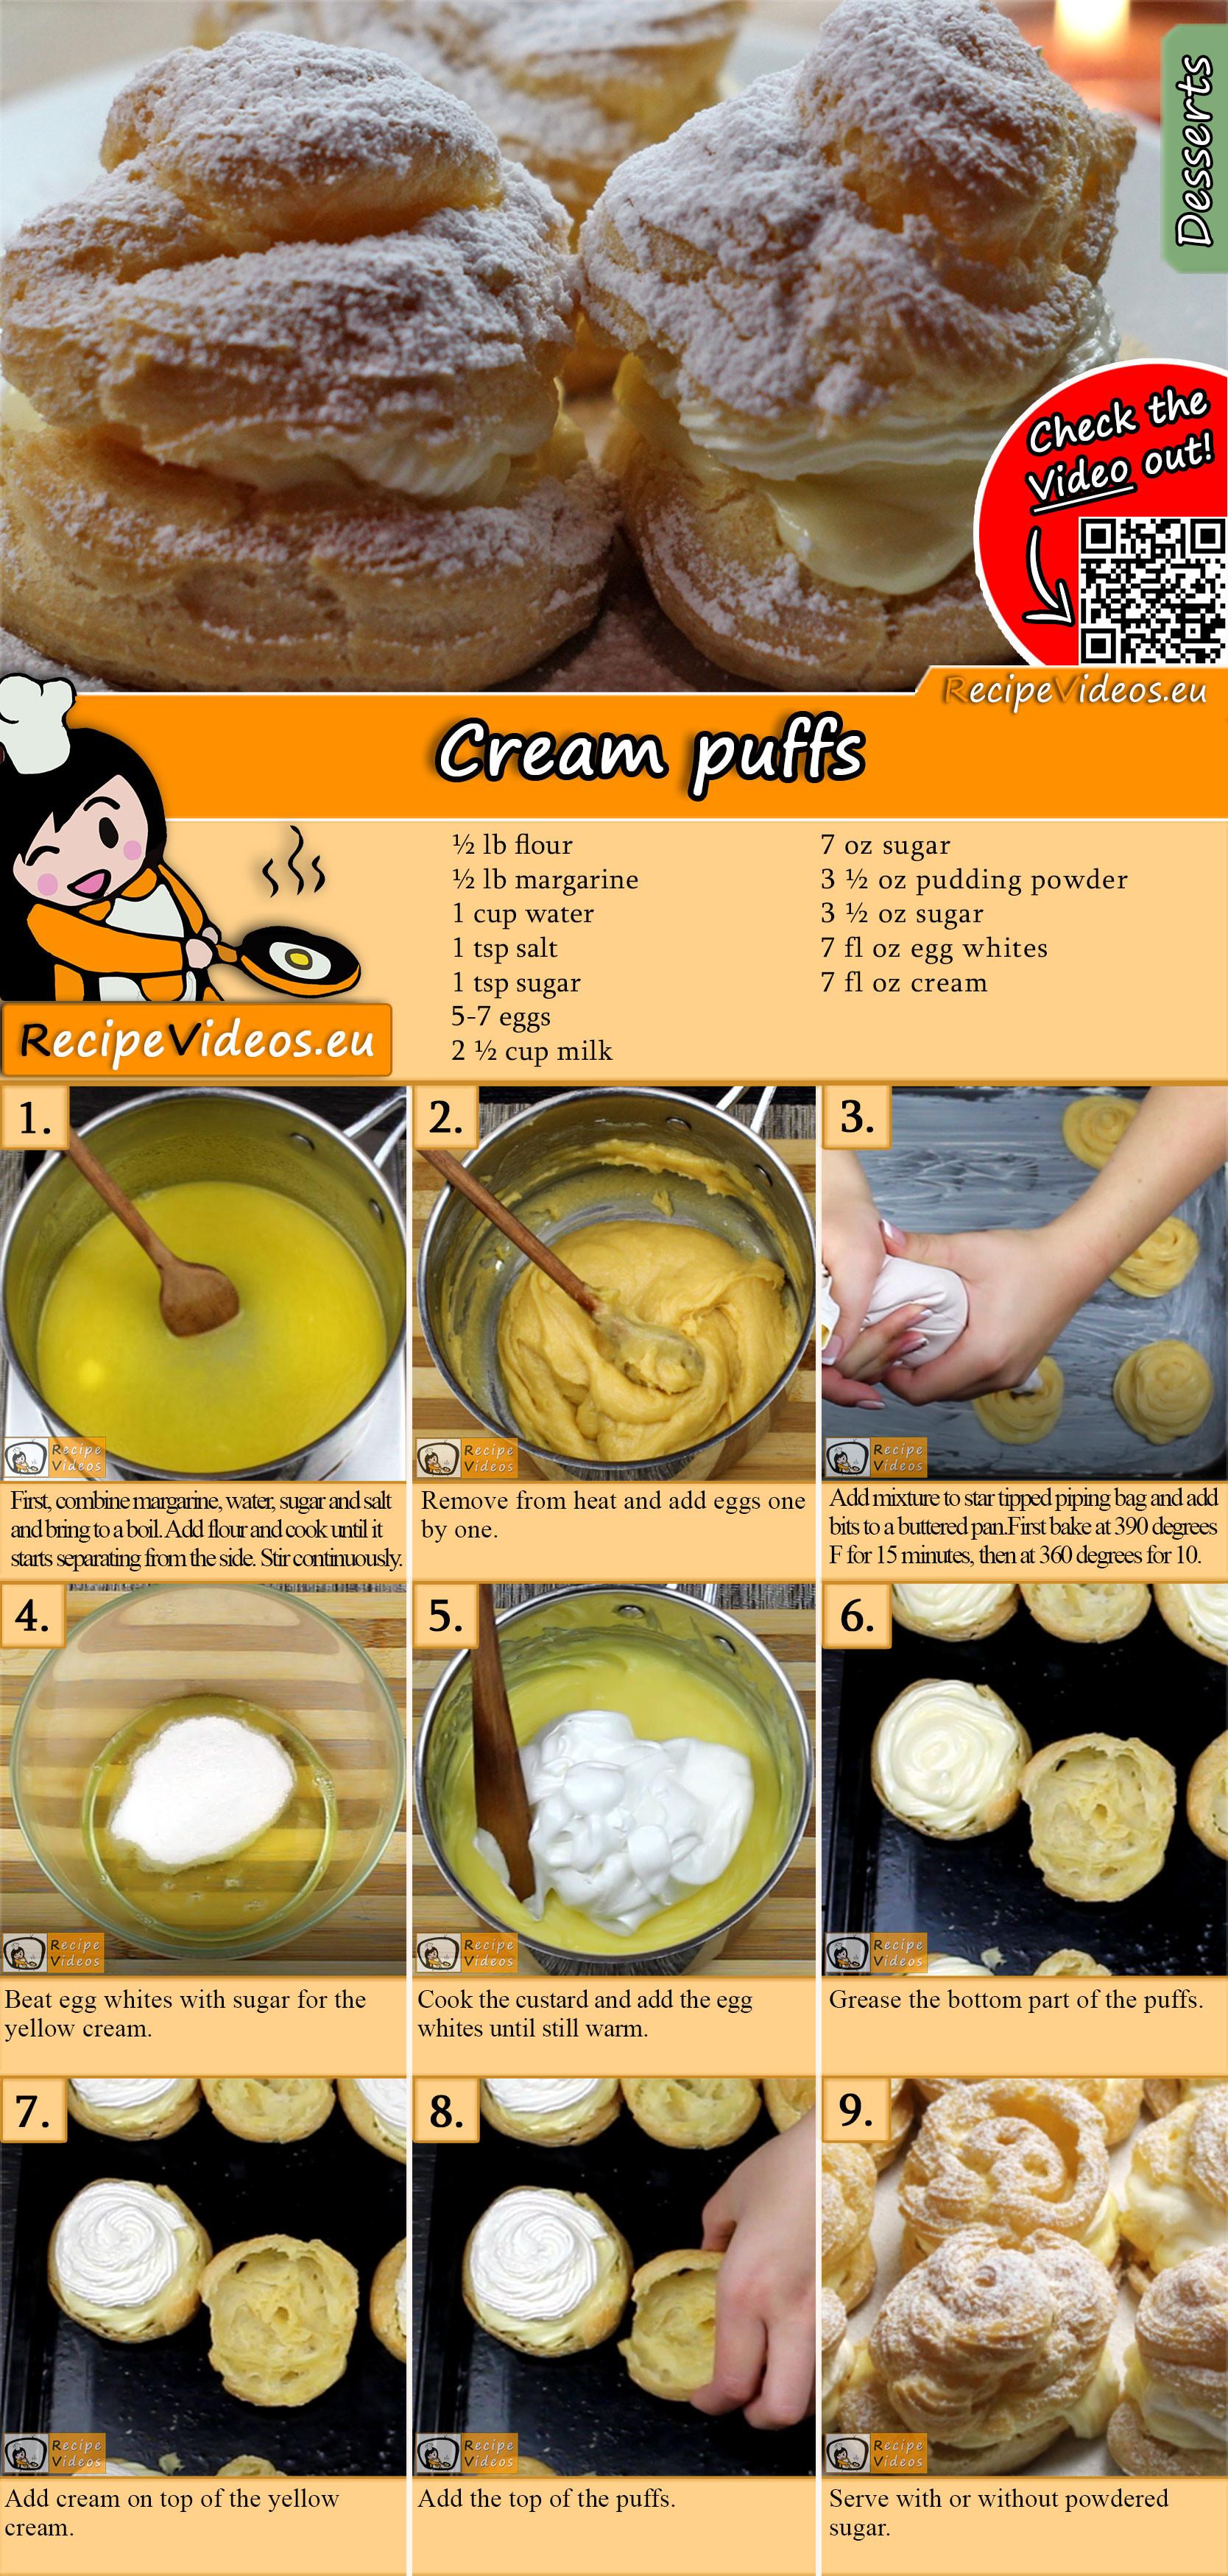 Cream puffs recipe with video